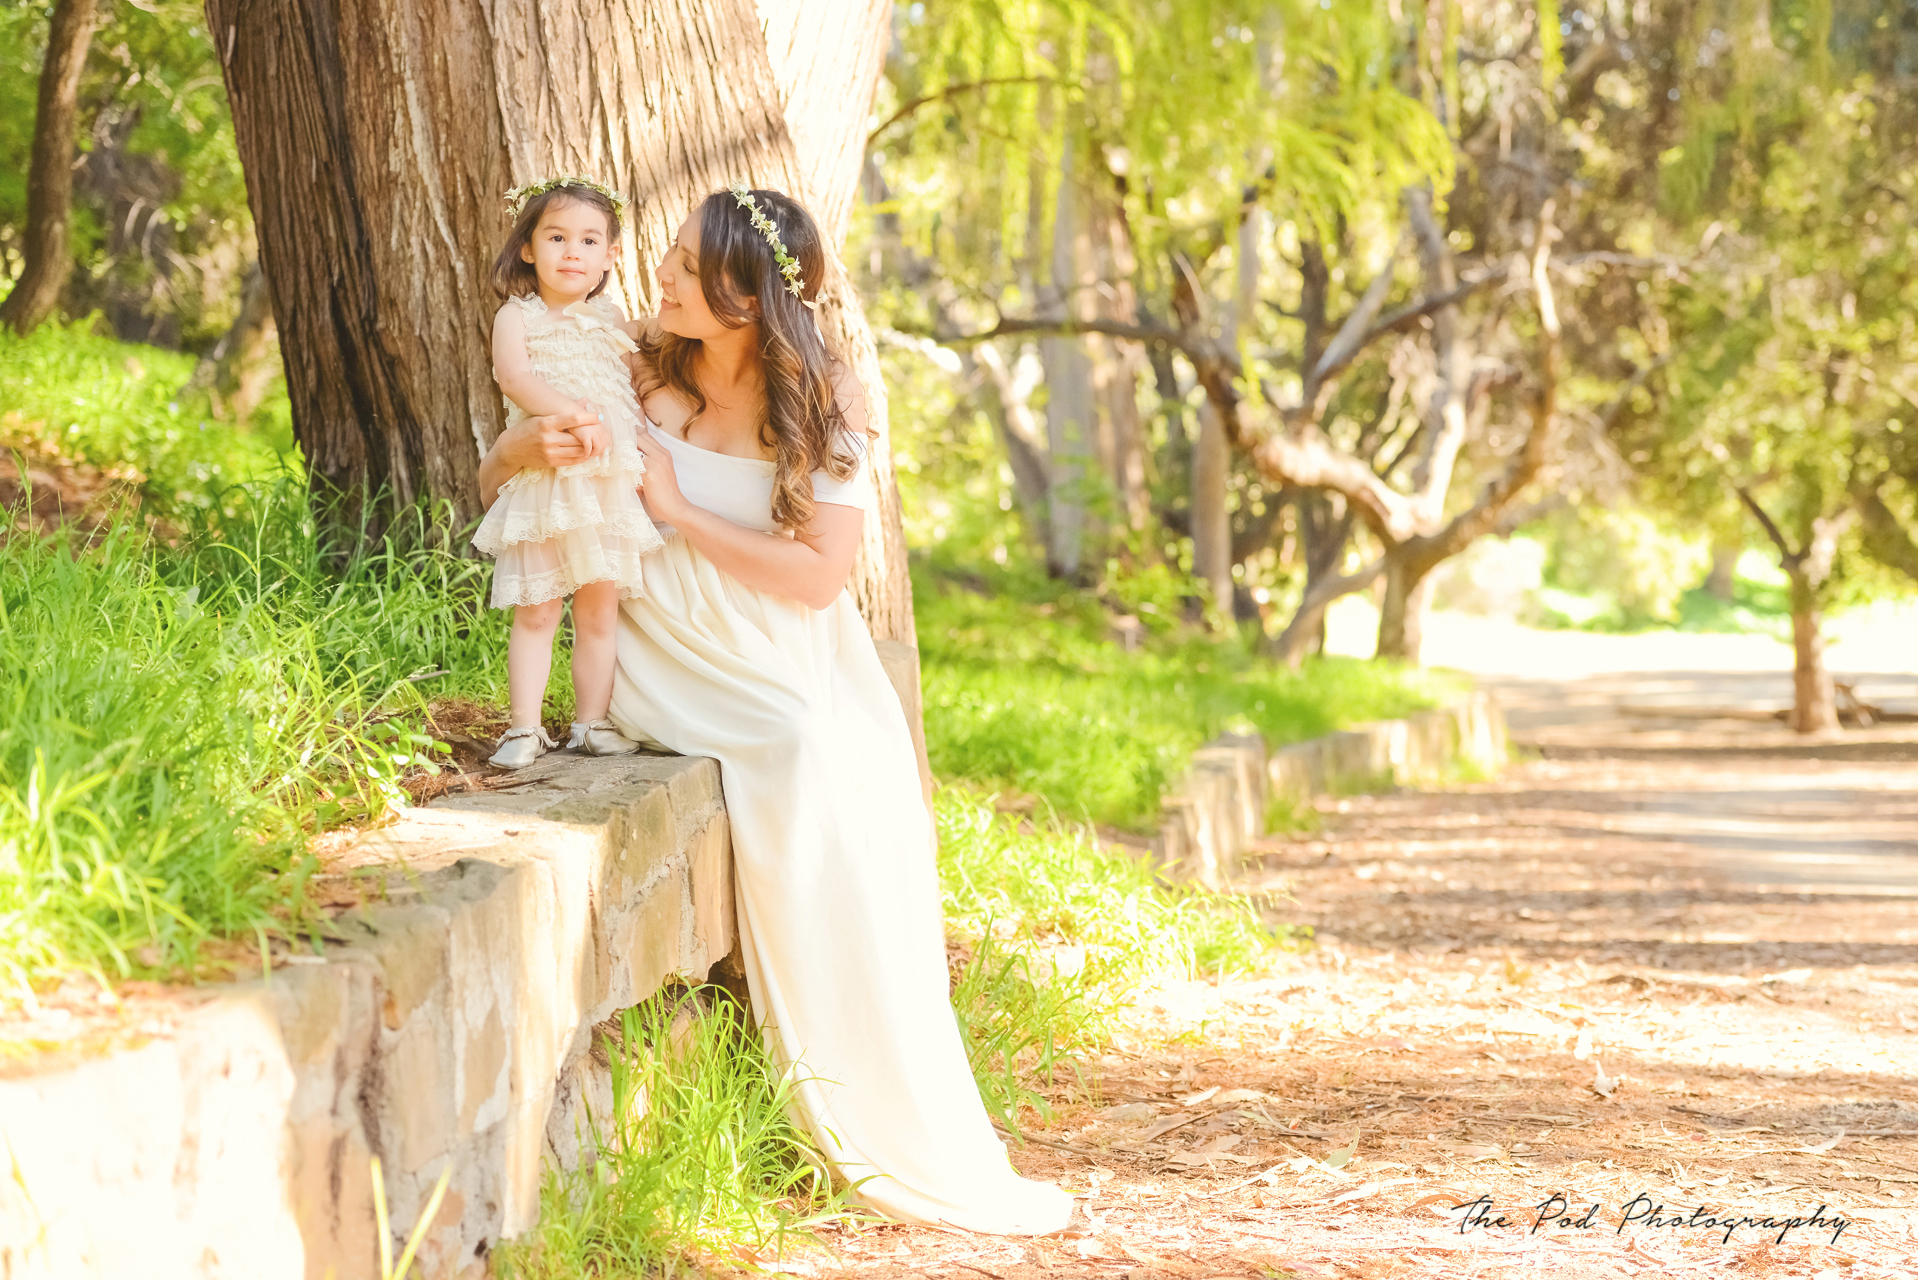 cca0ad2a5b49a Maternity Photographer Malibu | Rustic Pregnancy Outdoor Photo Shoot ...